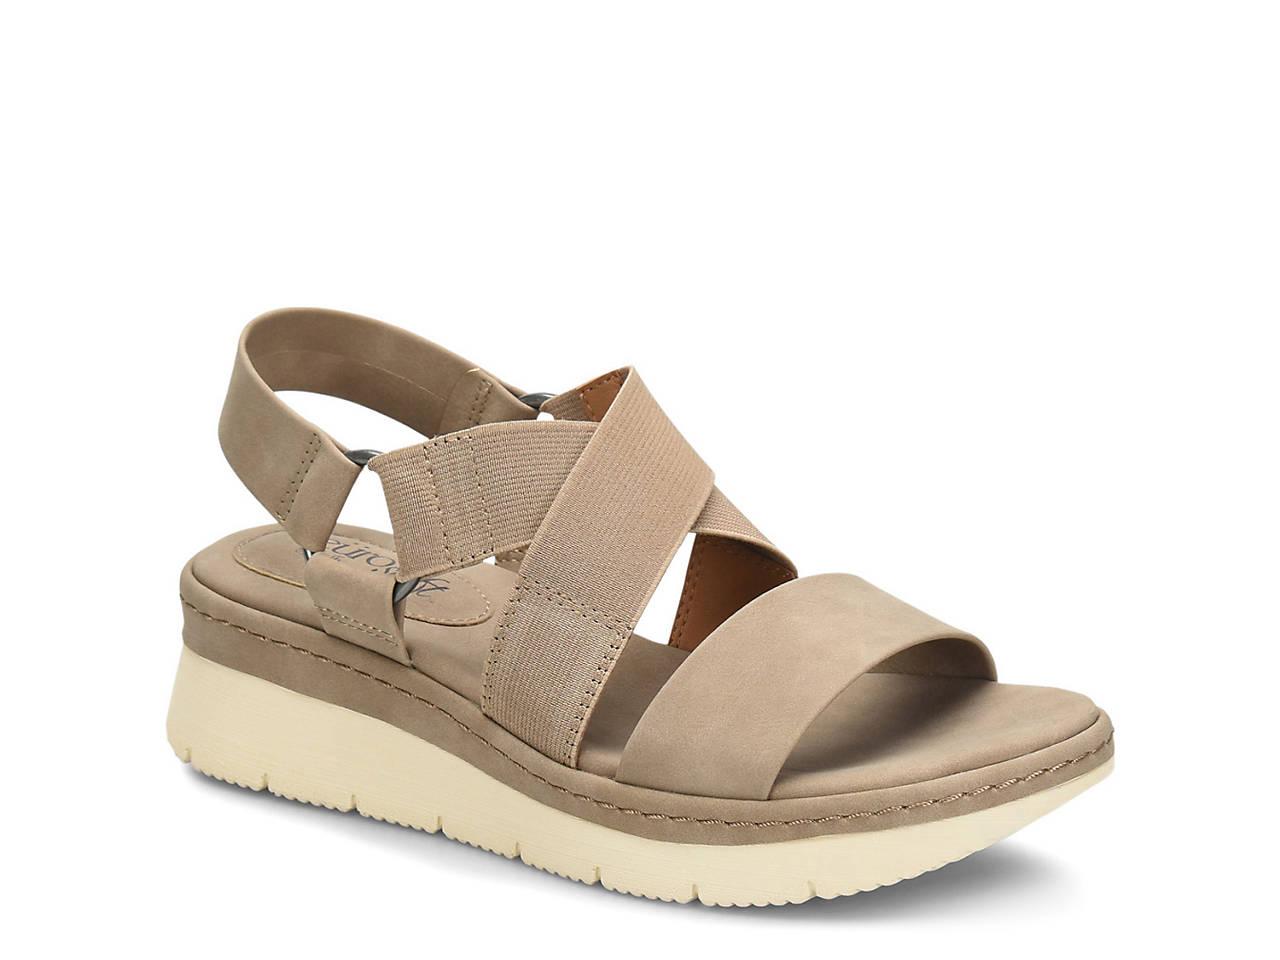 52f7a6eb227b Eurosoft Cambry Wedge Sandal Women s Shoes